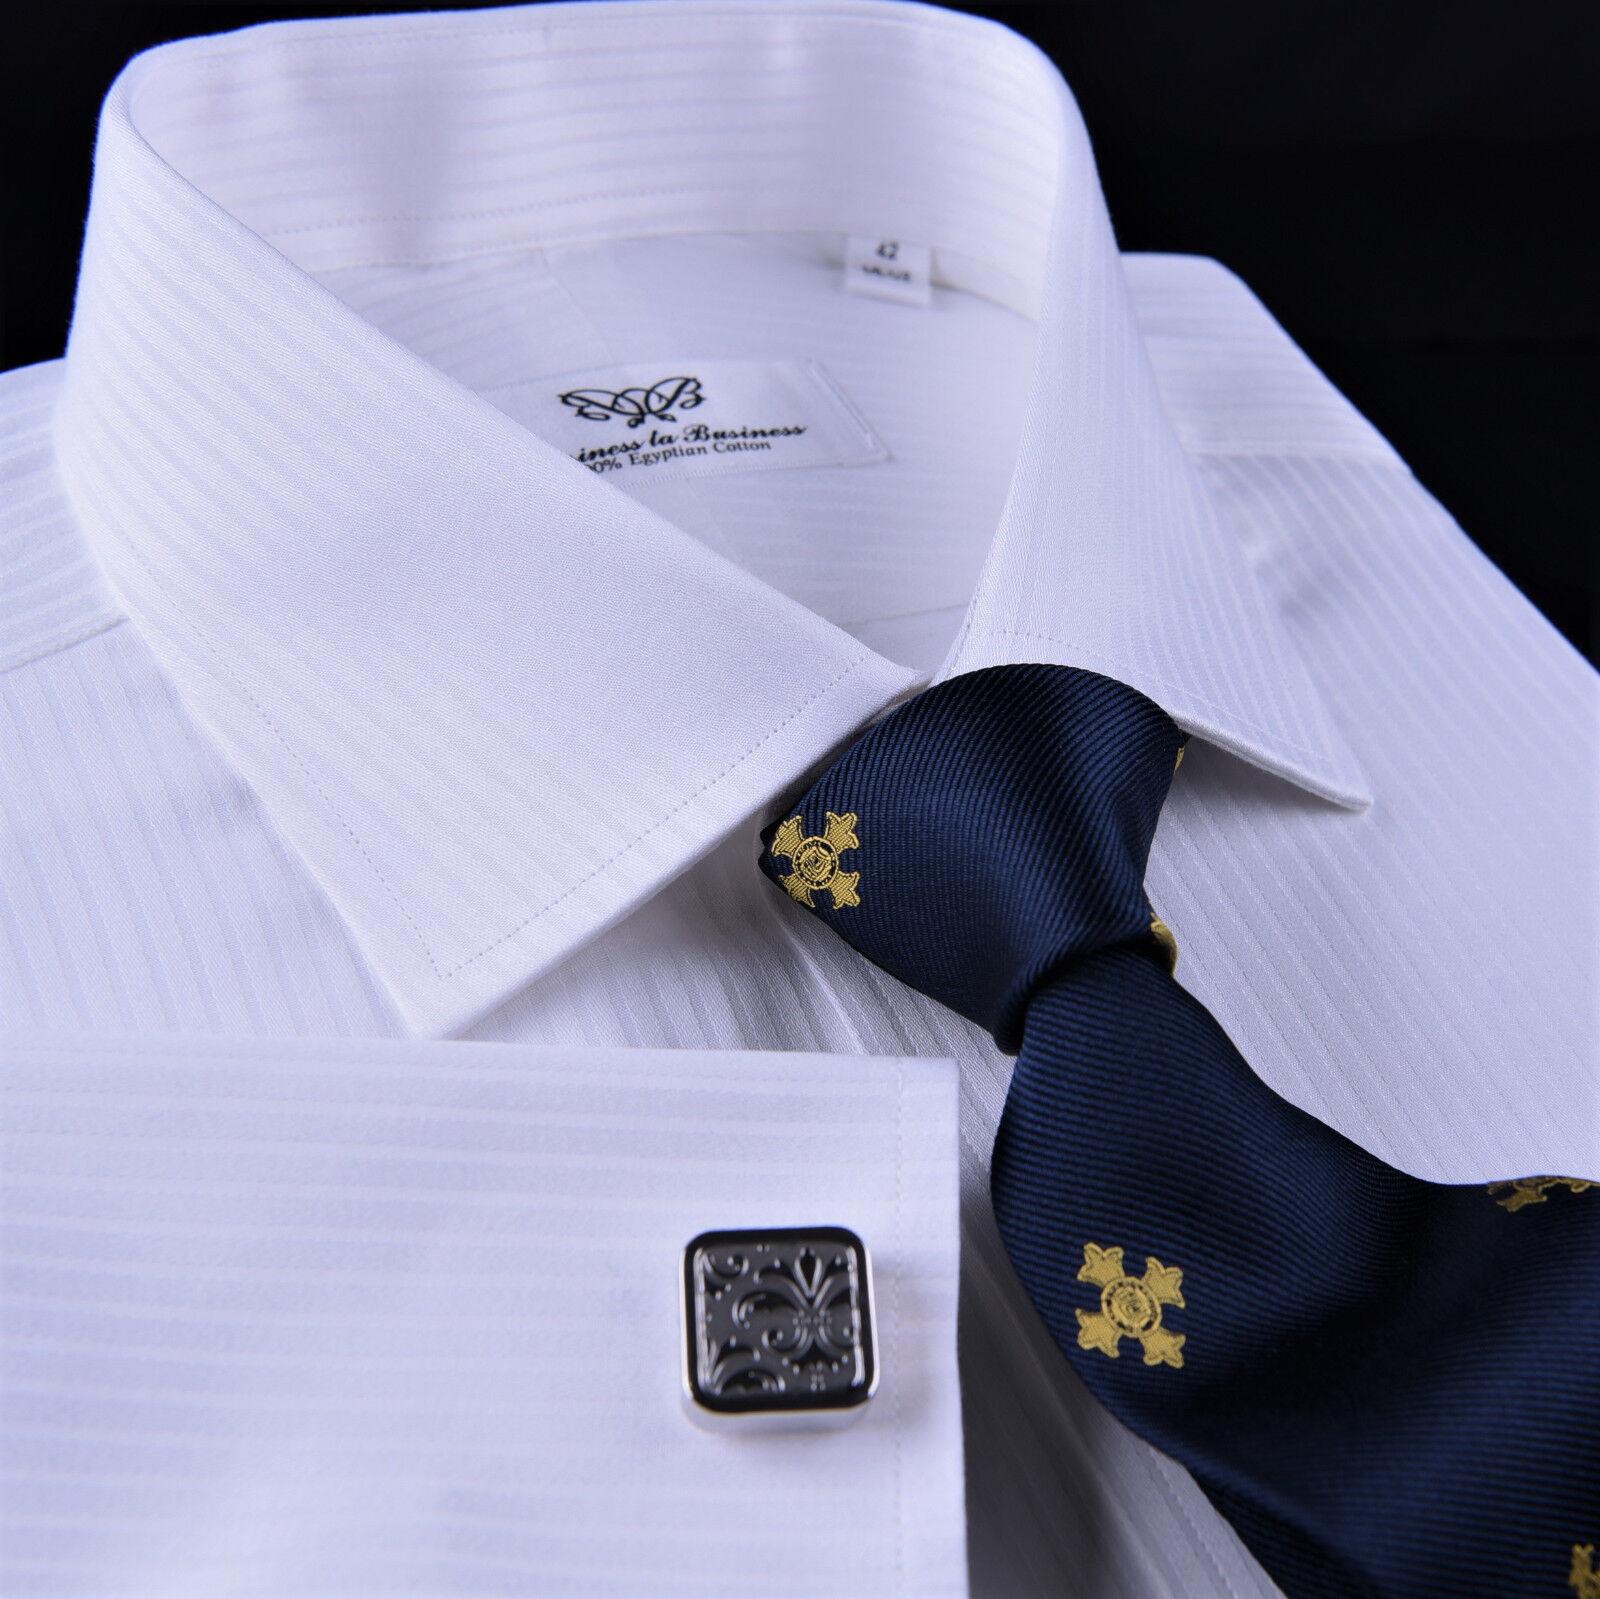 Classic Weiß Twill Striped Formal Geschäft Dress Shirt Sexy French Double Cuffs